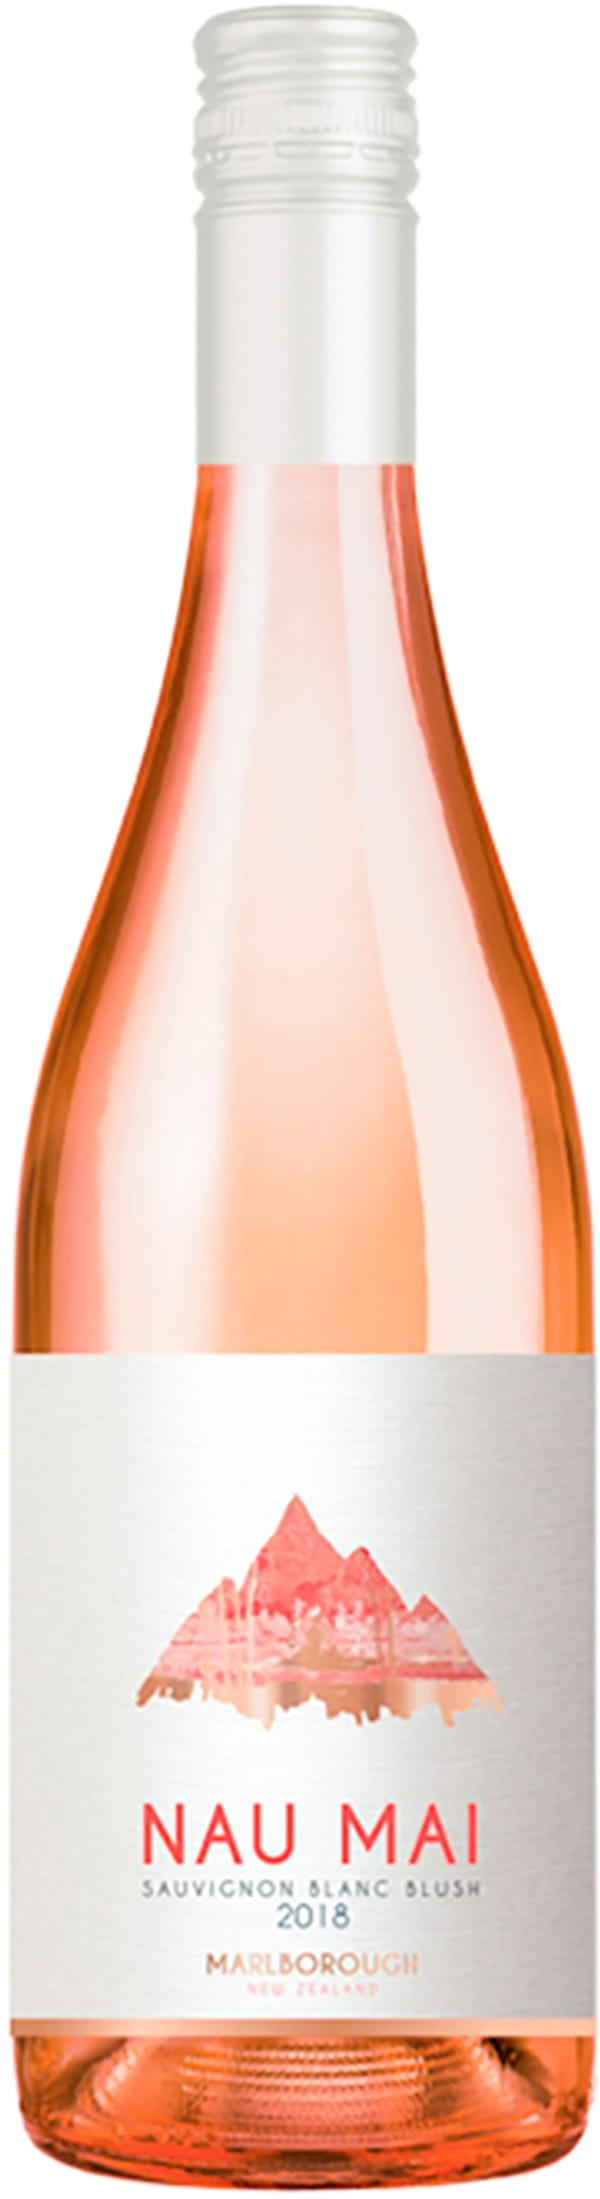 Nau Mai Sauvignon Blanc Blush 2019